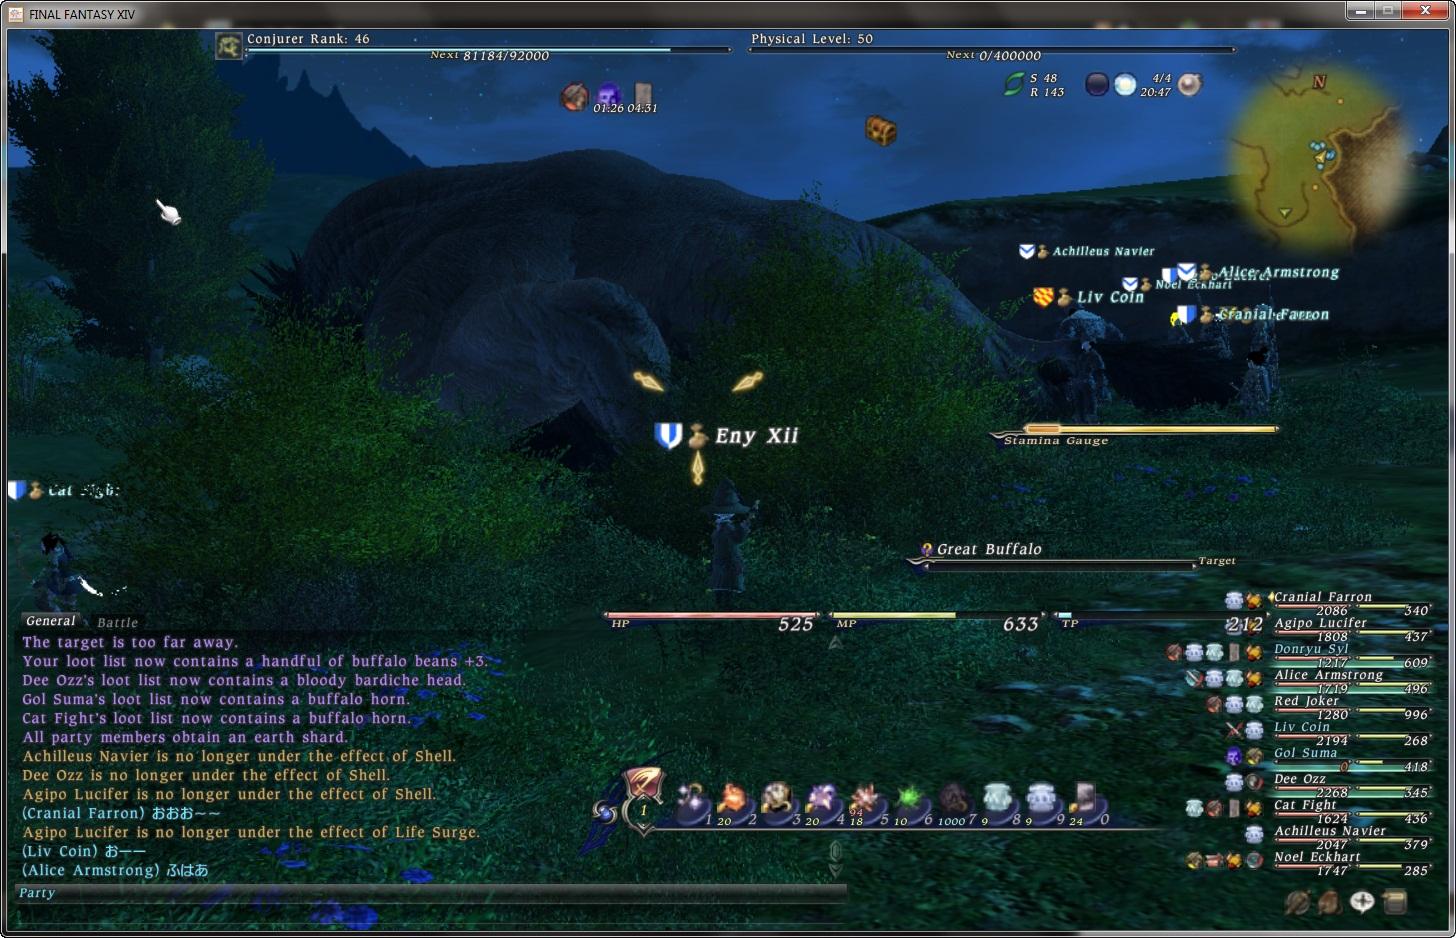 enygma55 ffxiv beta still edit ignore this favouritebest your screenshots wait post